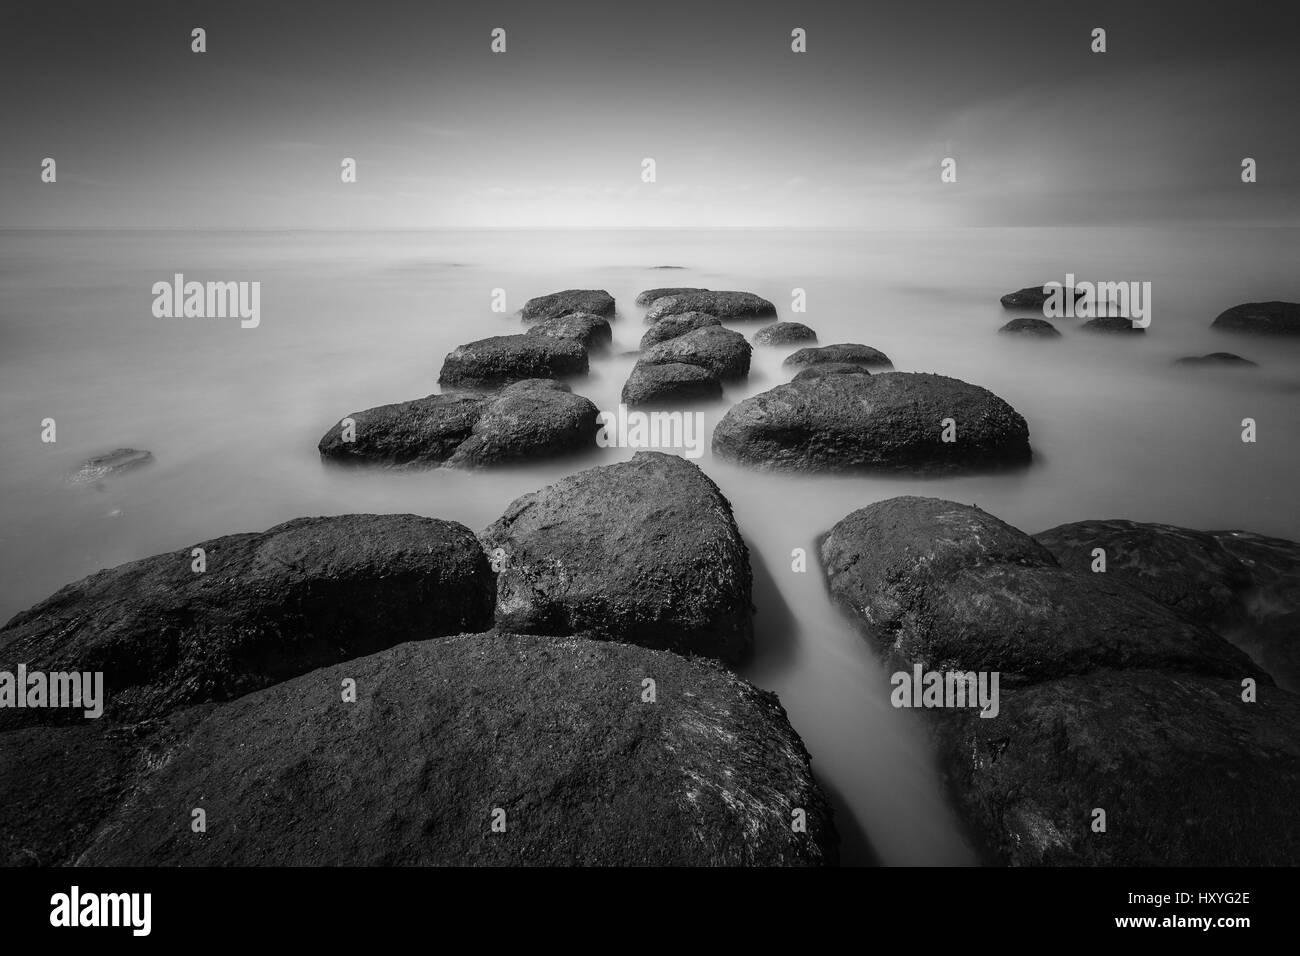 Hunstanton Boulders in Sea, Long exposure, Norfolk Stock Photo